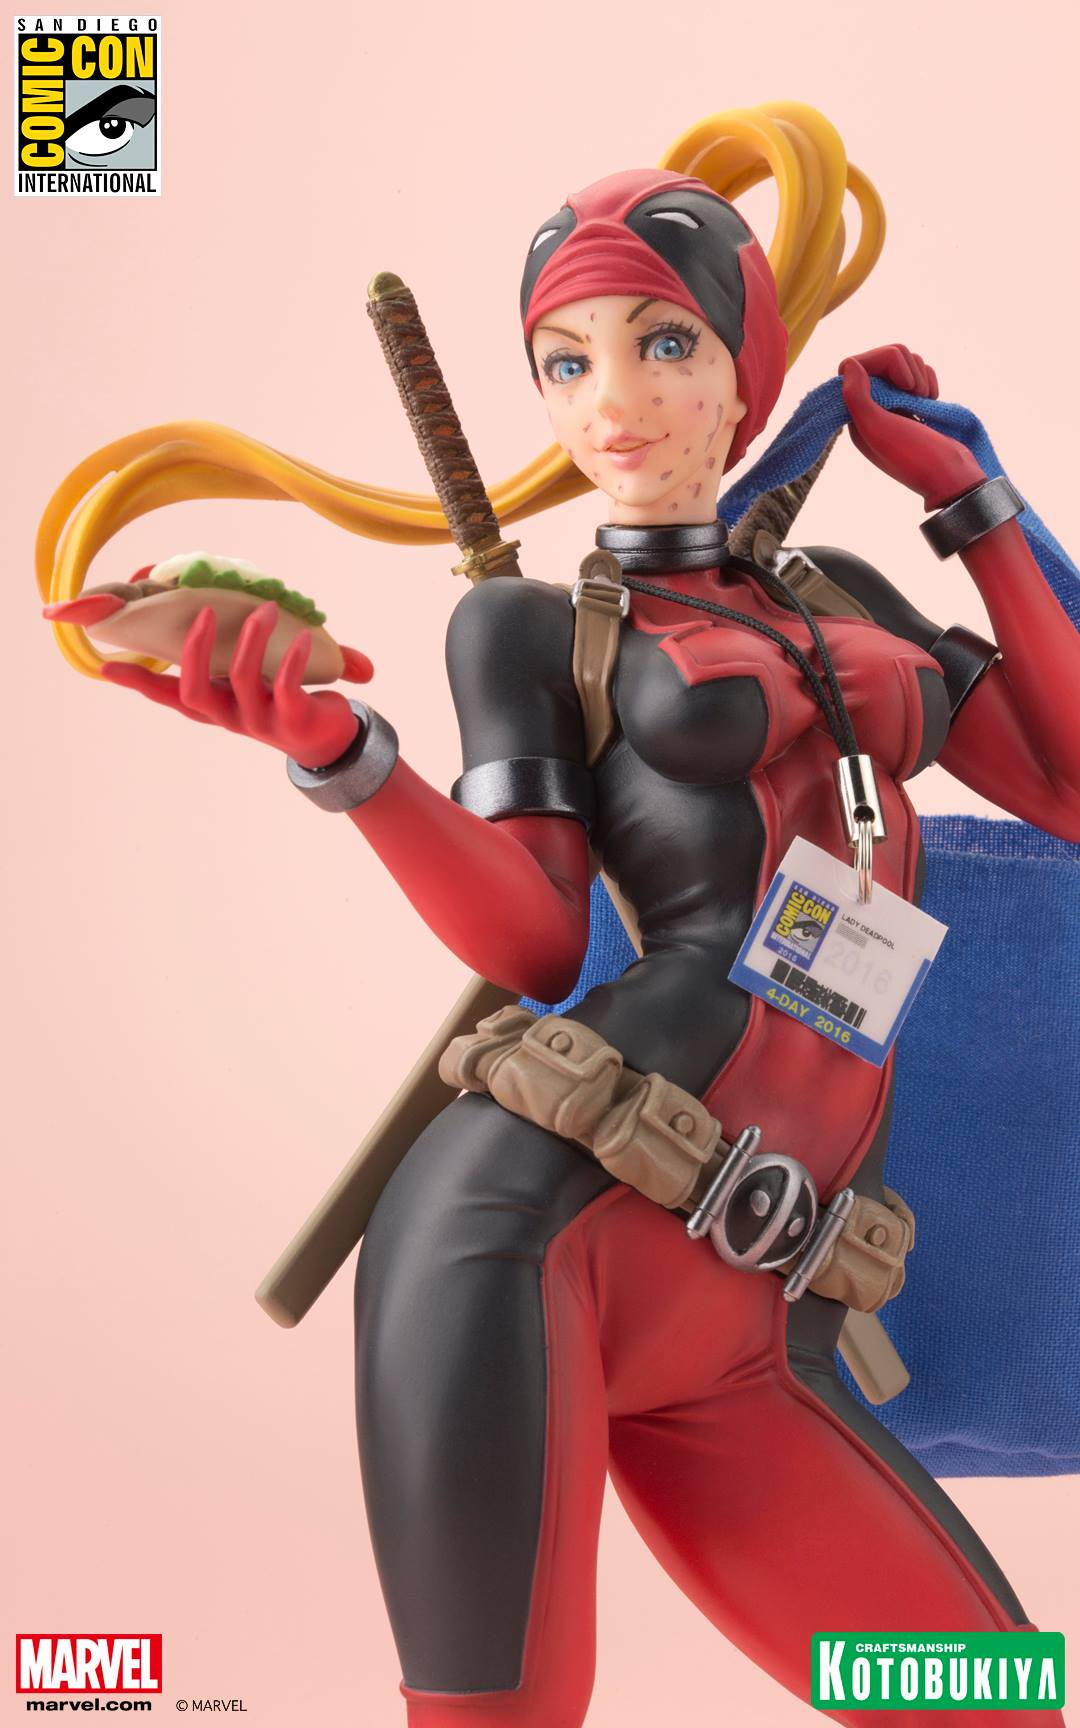 lady-deadpool-2016-sdcc-exclusive-bishoujo-statue-kotobukiya-marvel-10